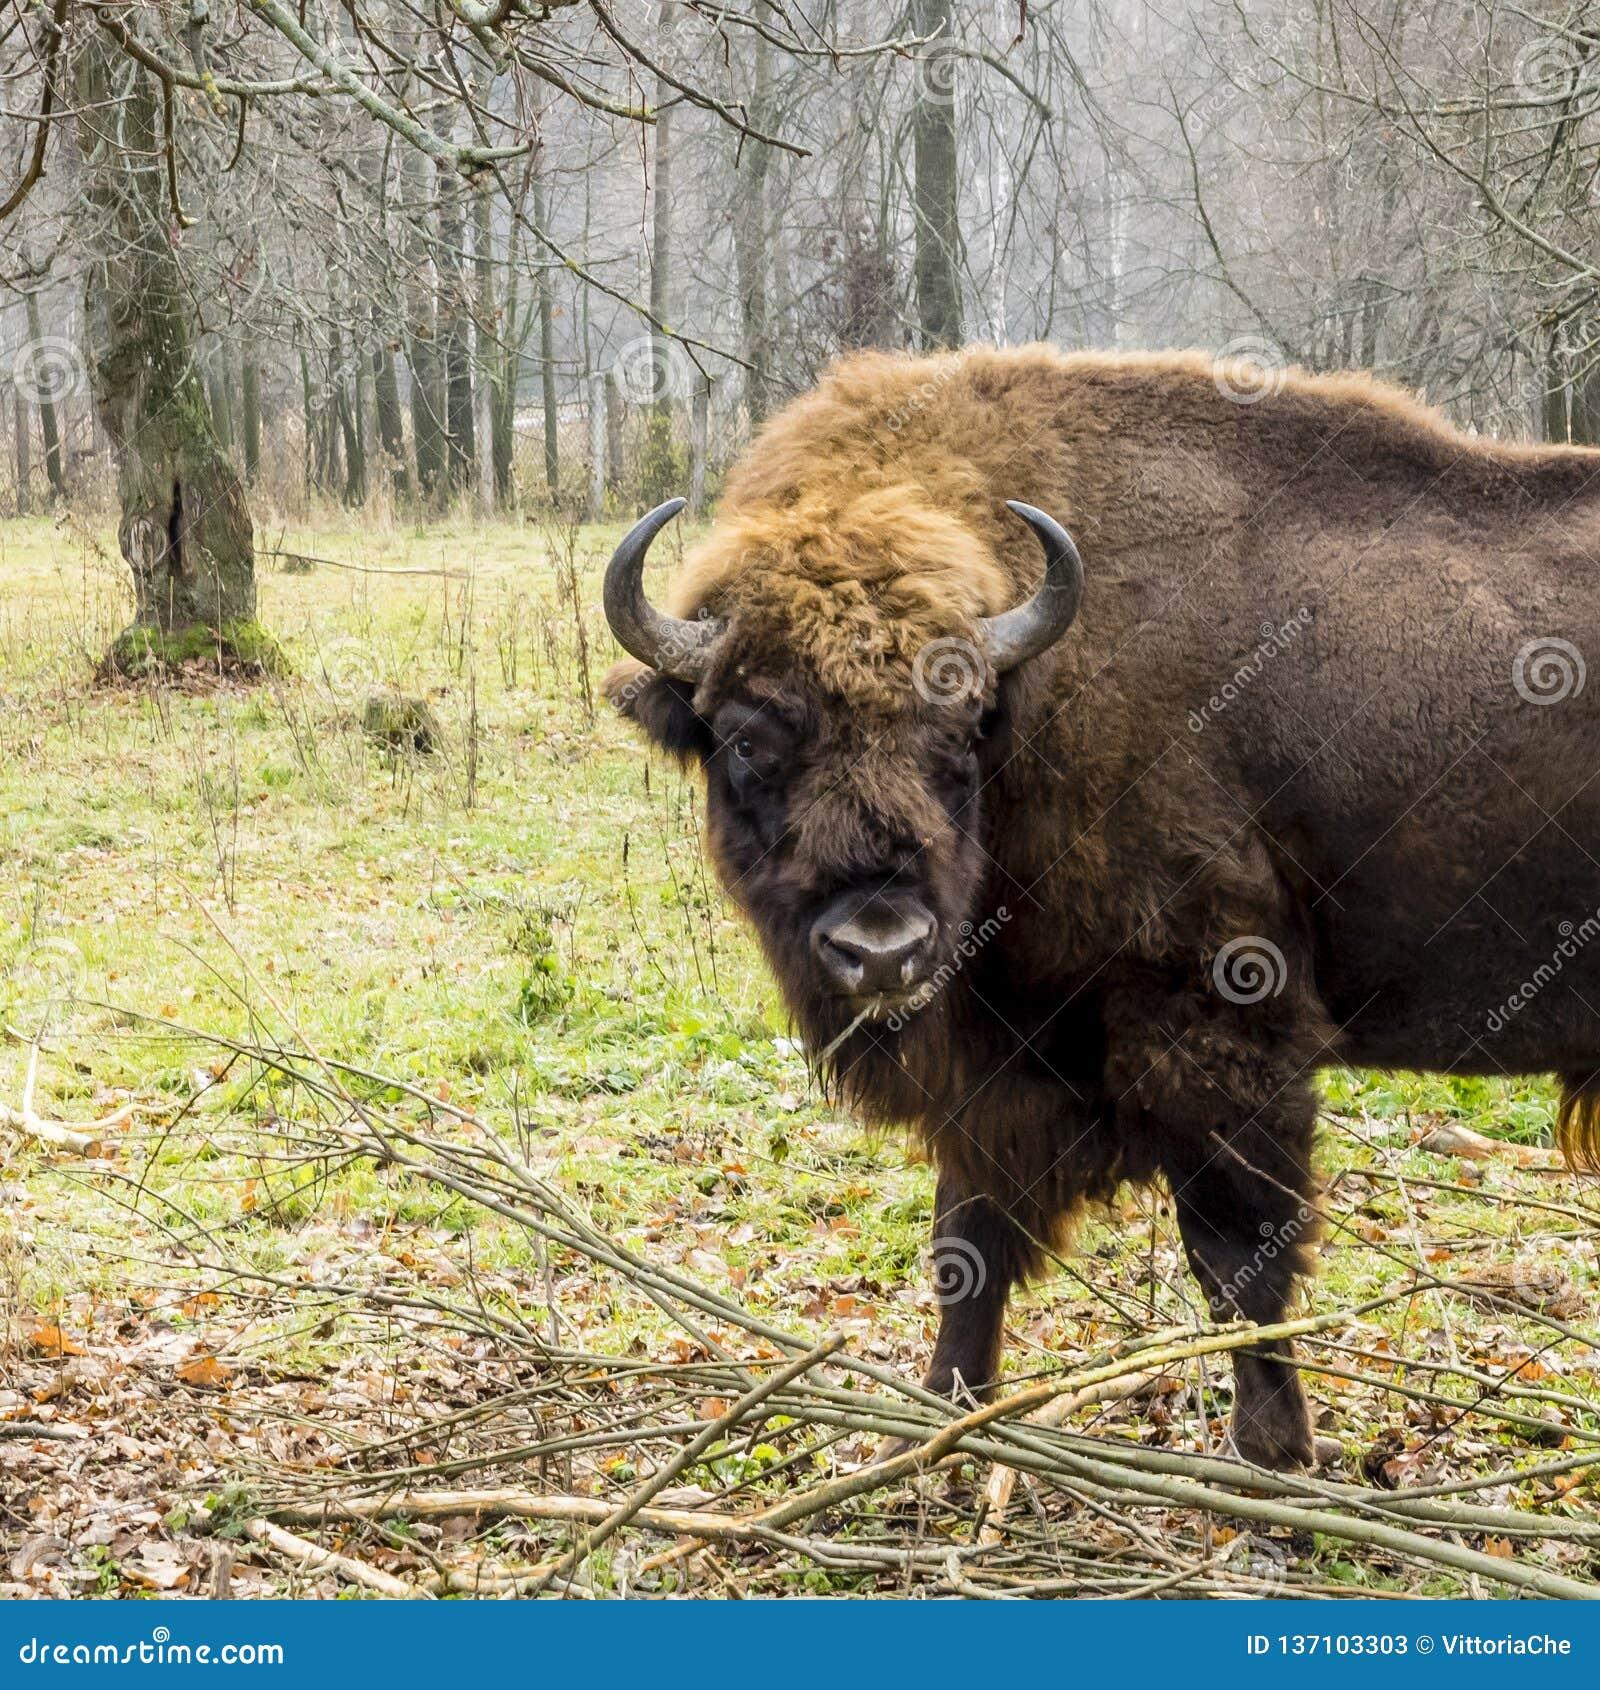 Aurochs στο δάσος ο ευρωπαϊκός bison bonasus βισώνων, επίσης γνωστός ως wisent ή ευρωπαϊκός ξύλινος βίσωνας, Ρωσία